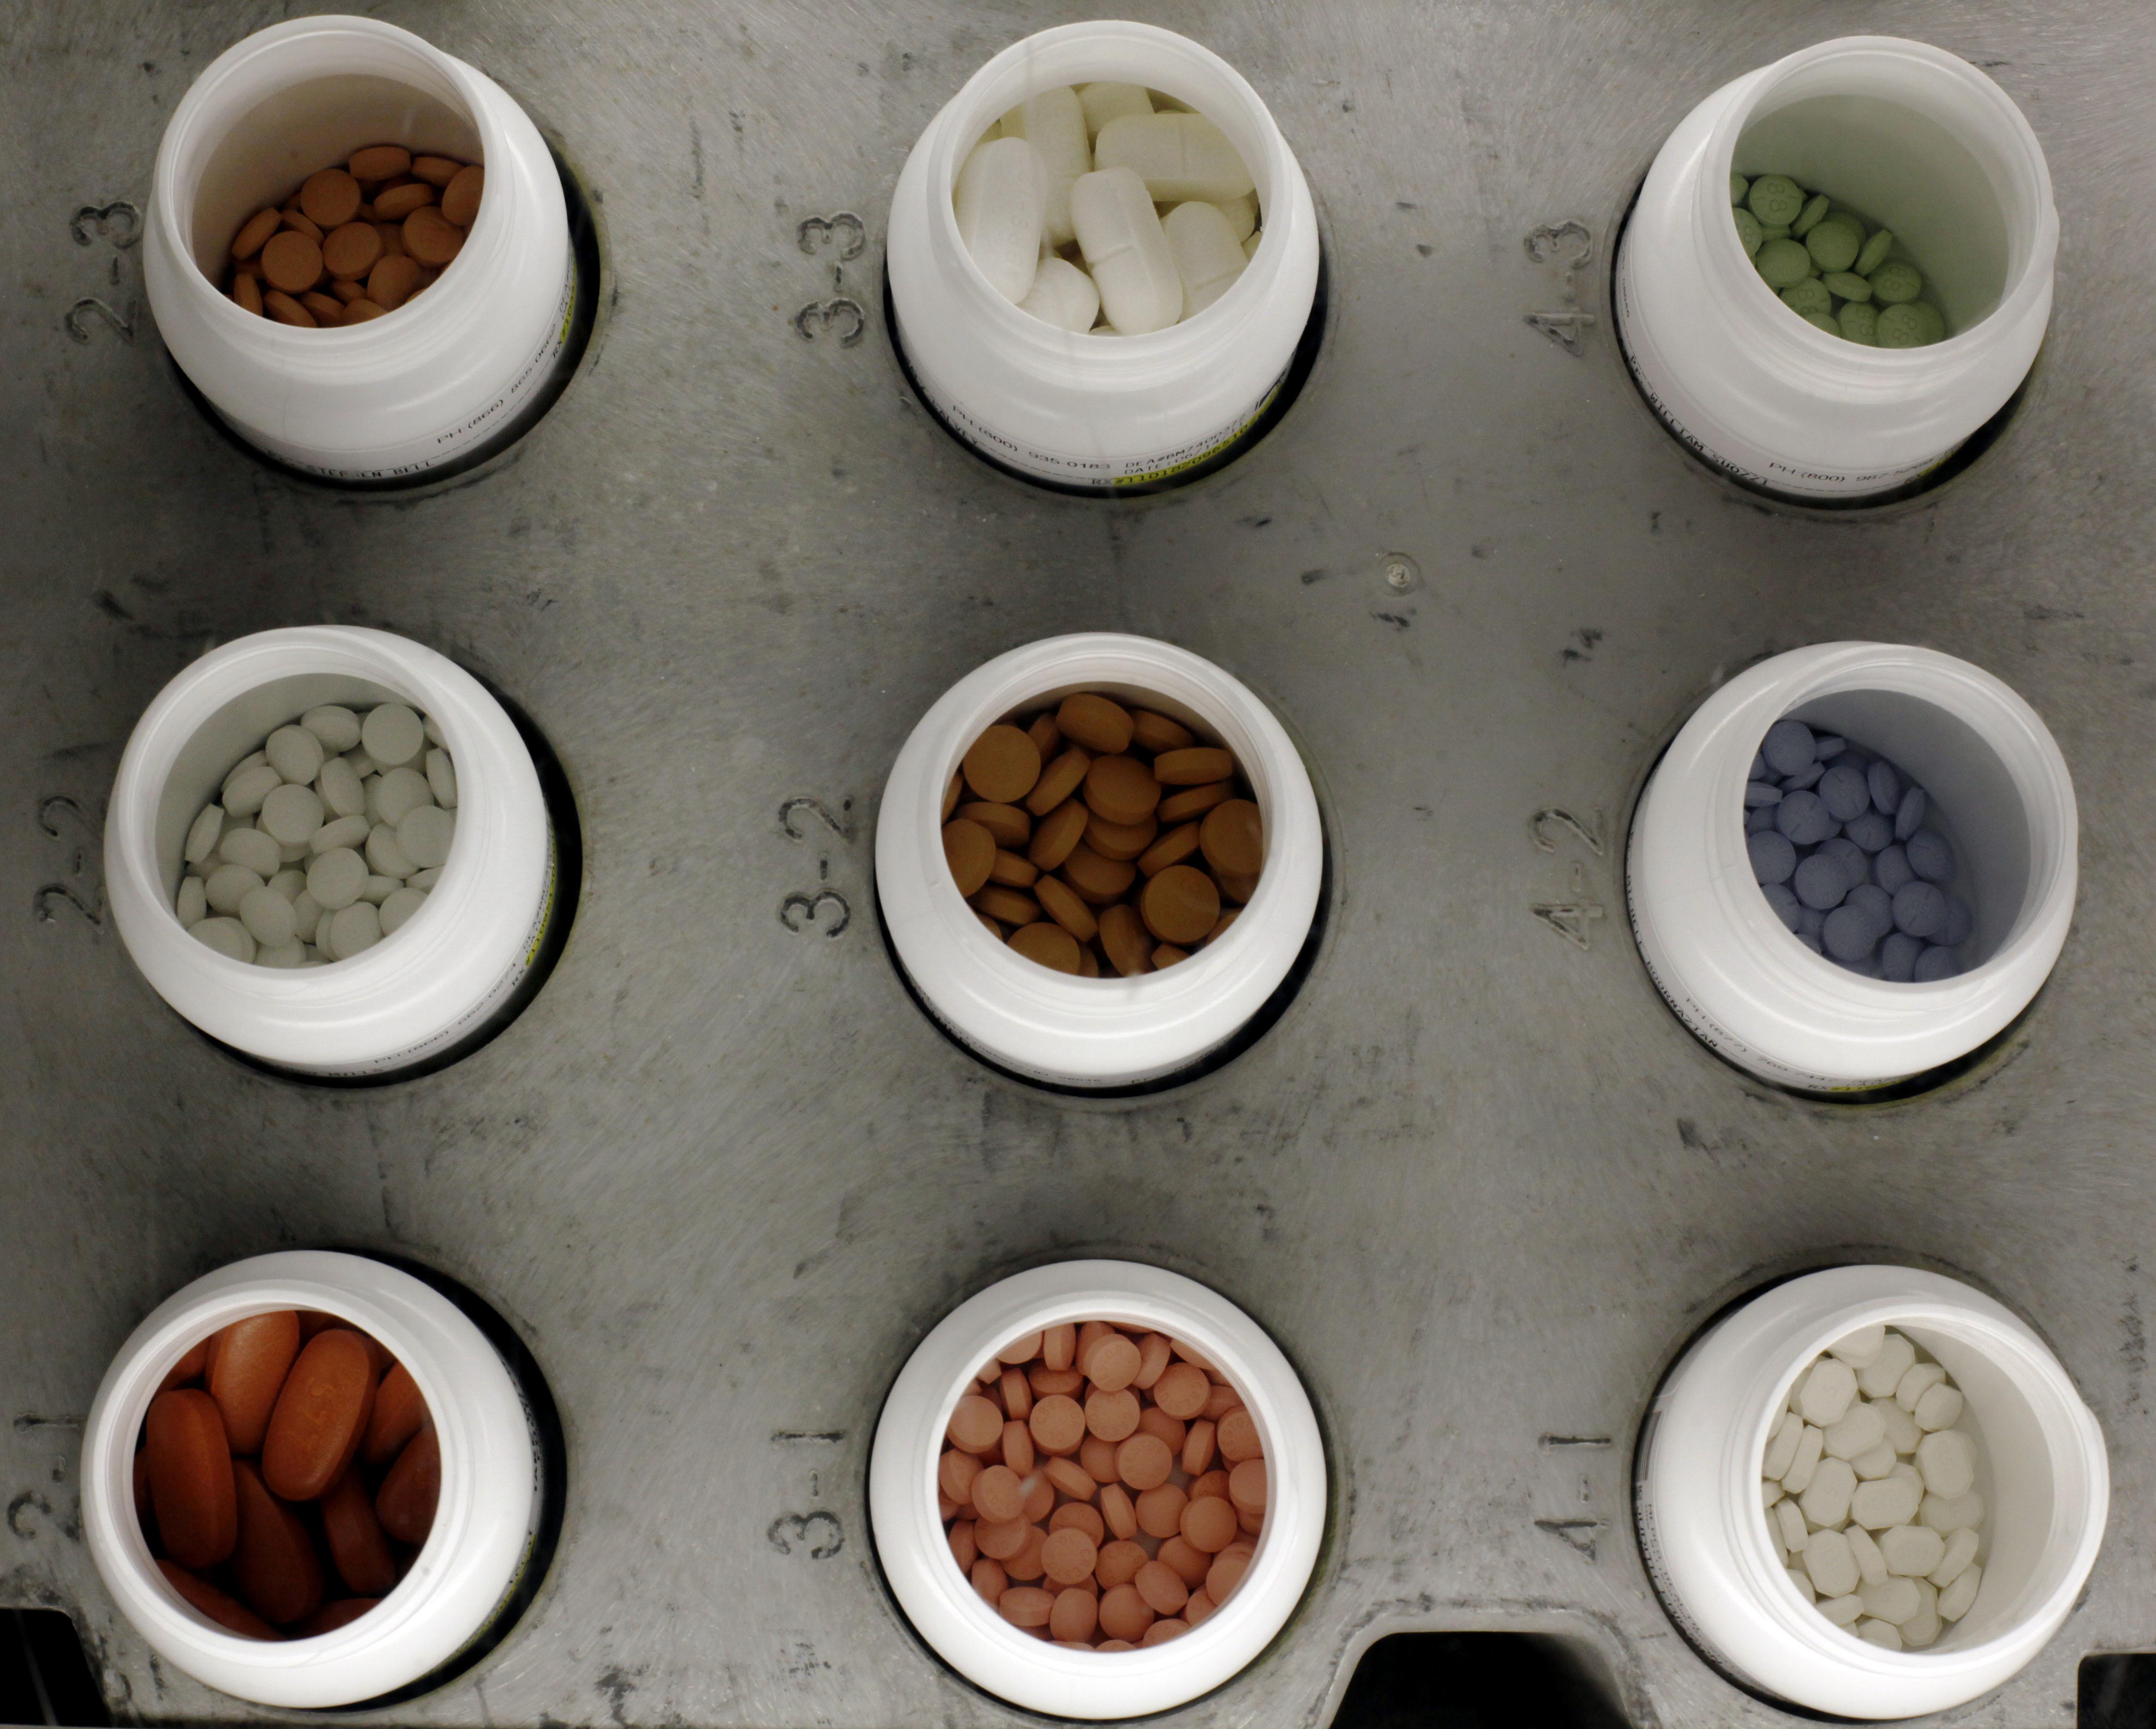 Drug Costs Prompt Call For Medicare Changes News, Sports, Jobs The  Intelligencer Drug Costs